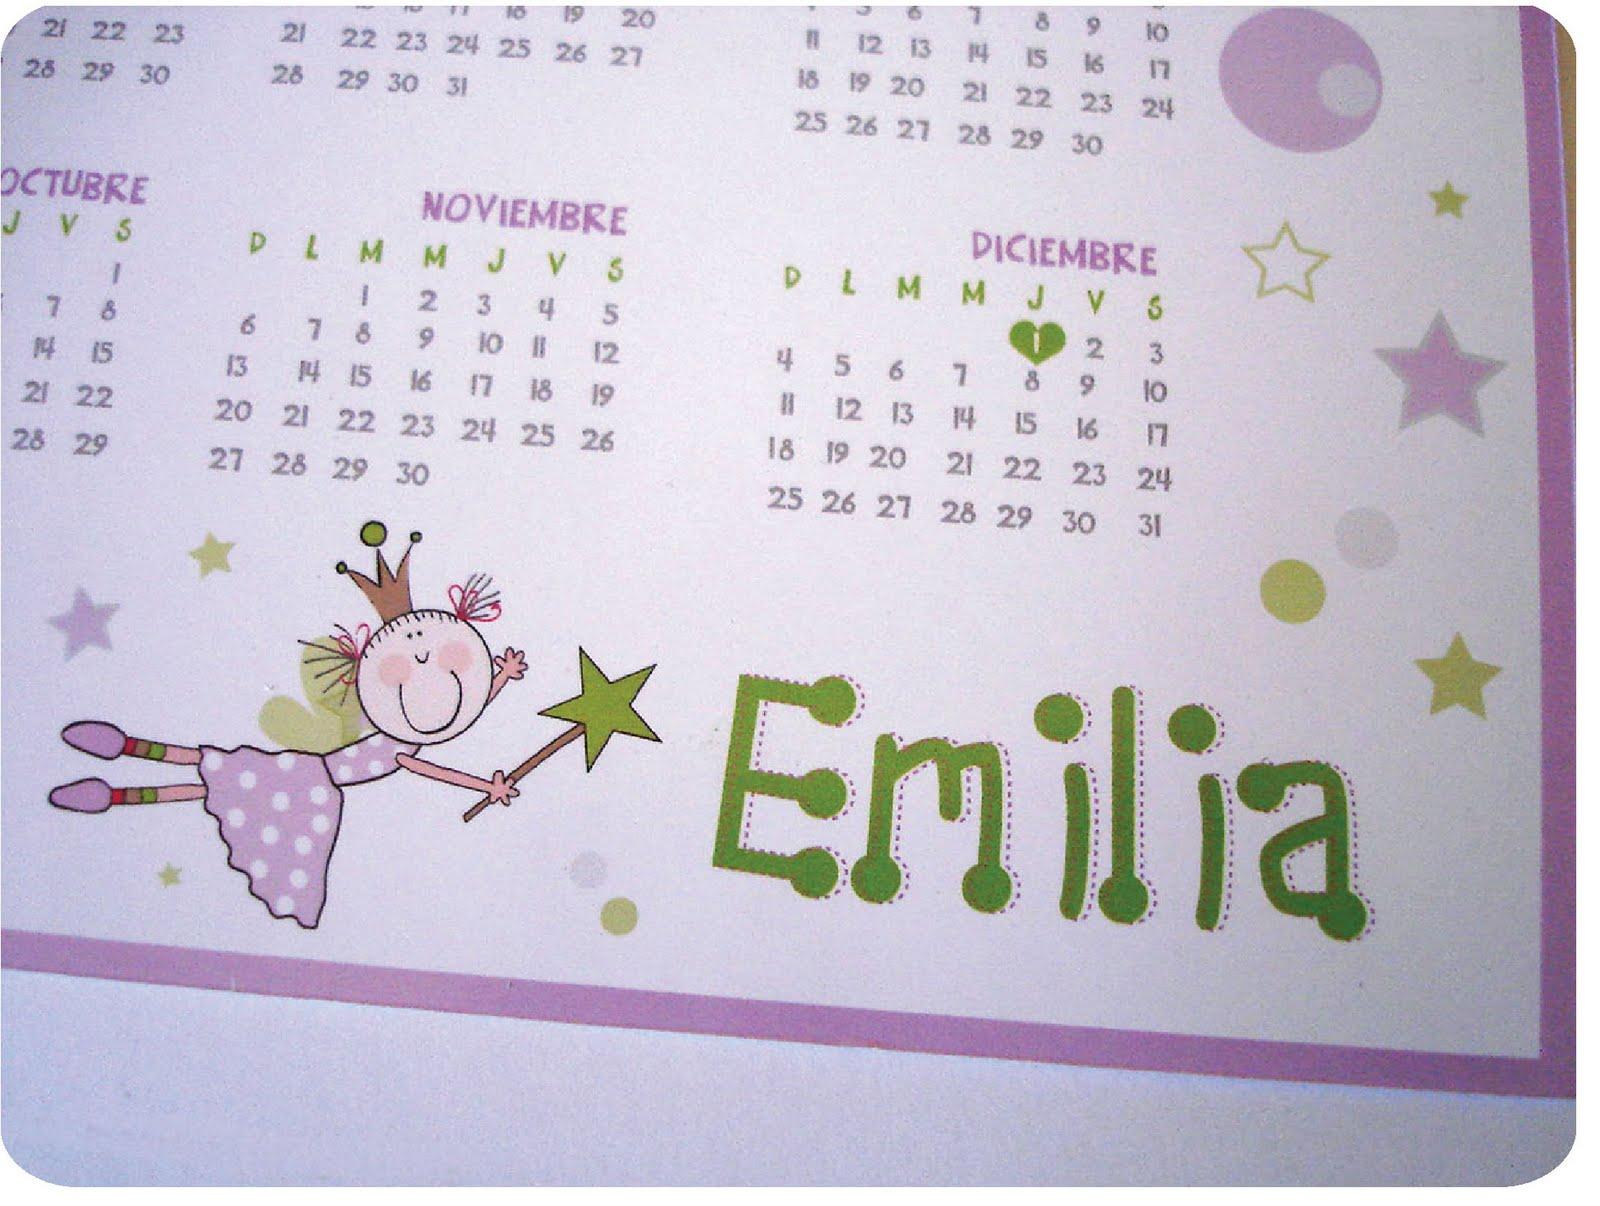 Croa Almanaques 2011